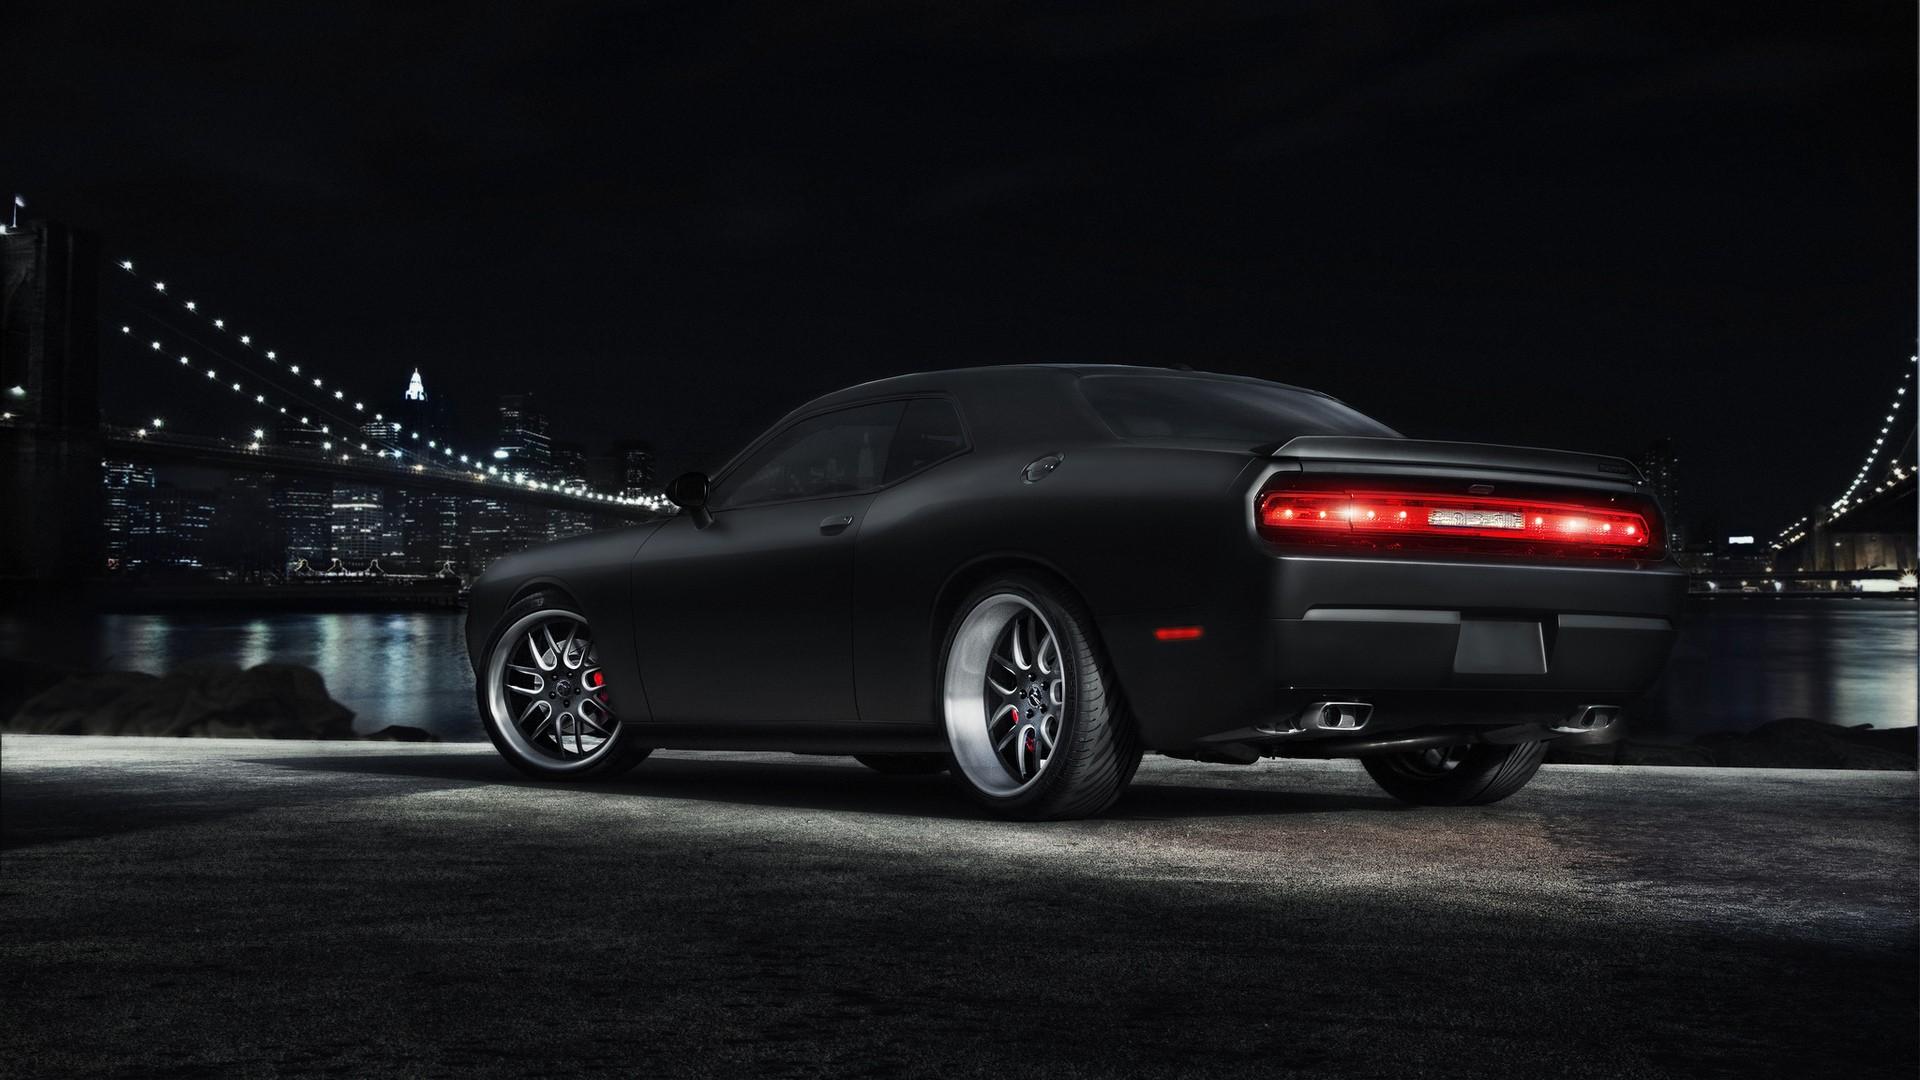 http://hdblackwallpaper.com/wallpaper/2015/07/red-and-black-muscle-cars-2-wide-wallpaper.jpg Muscle Cars Wallpapers High Resolution